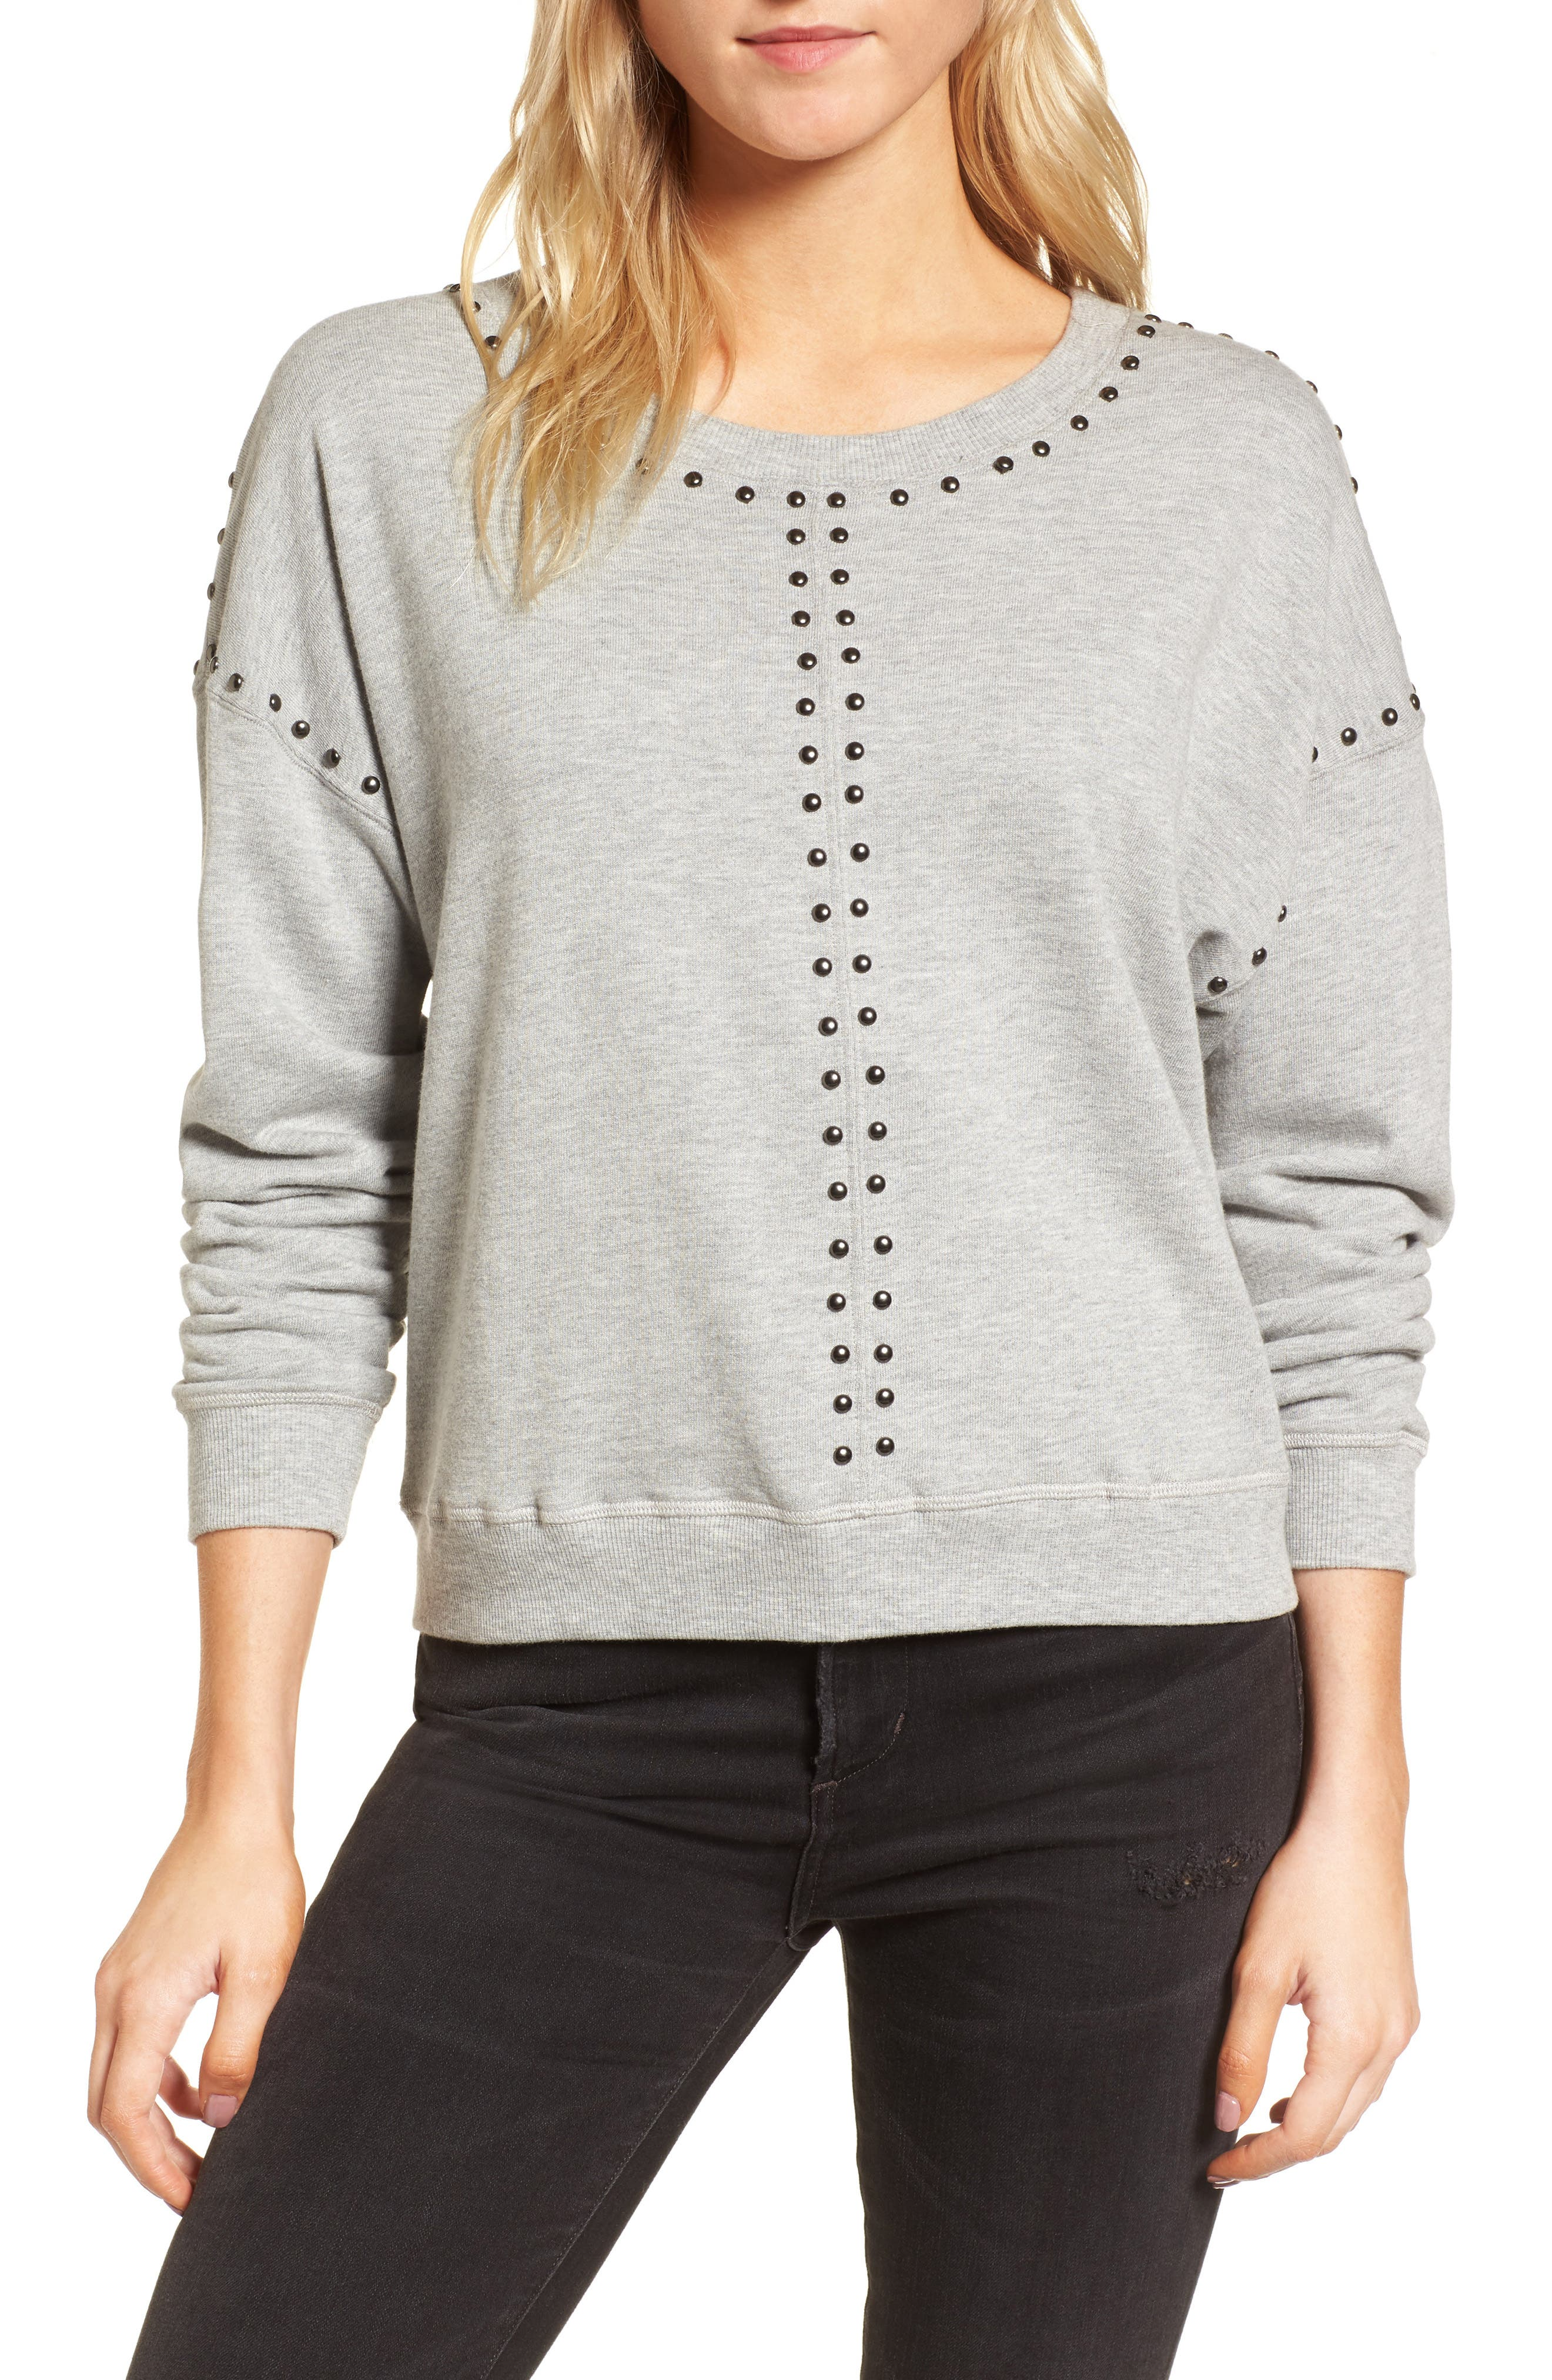 Wilson Studded Sweatshirt,                         Main,                         color, Heather Grey